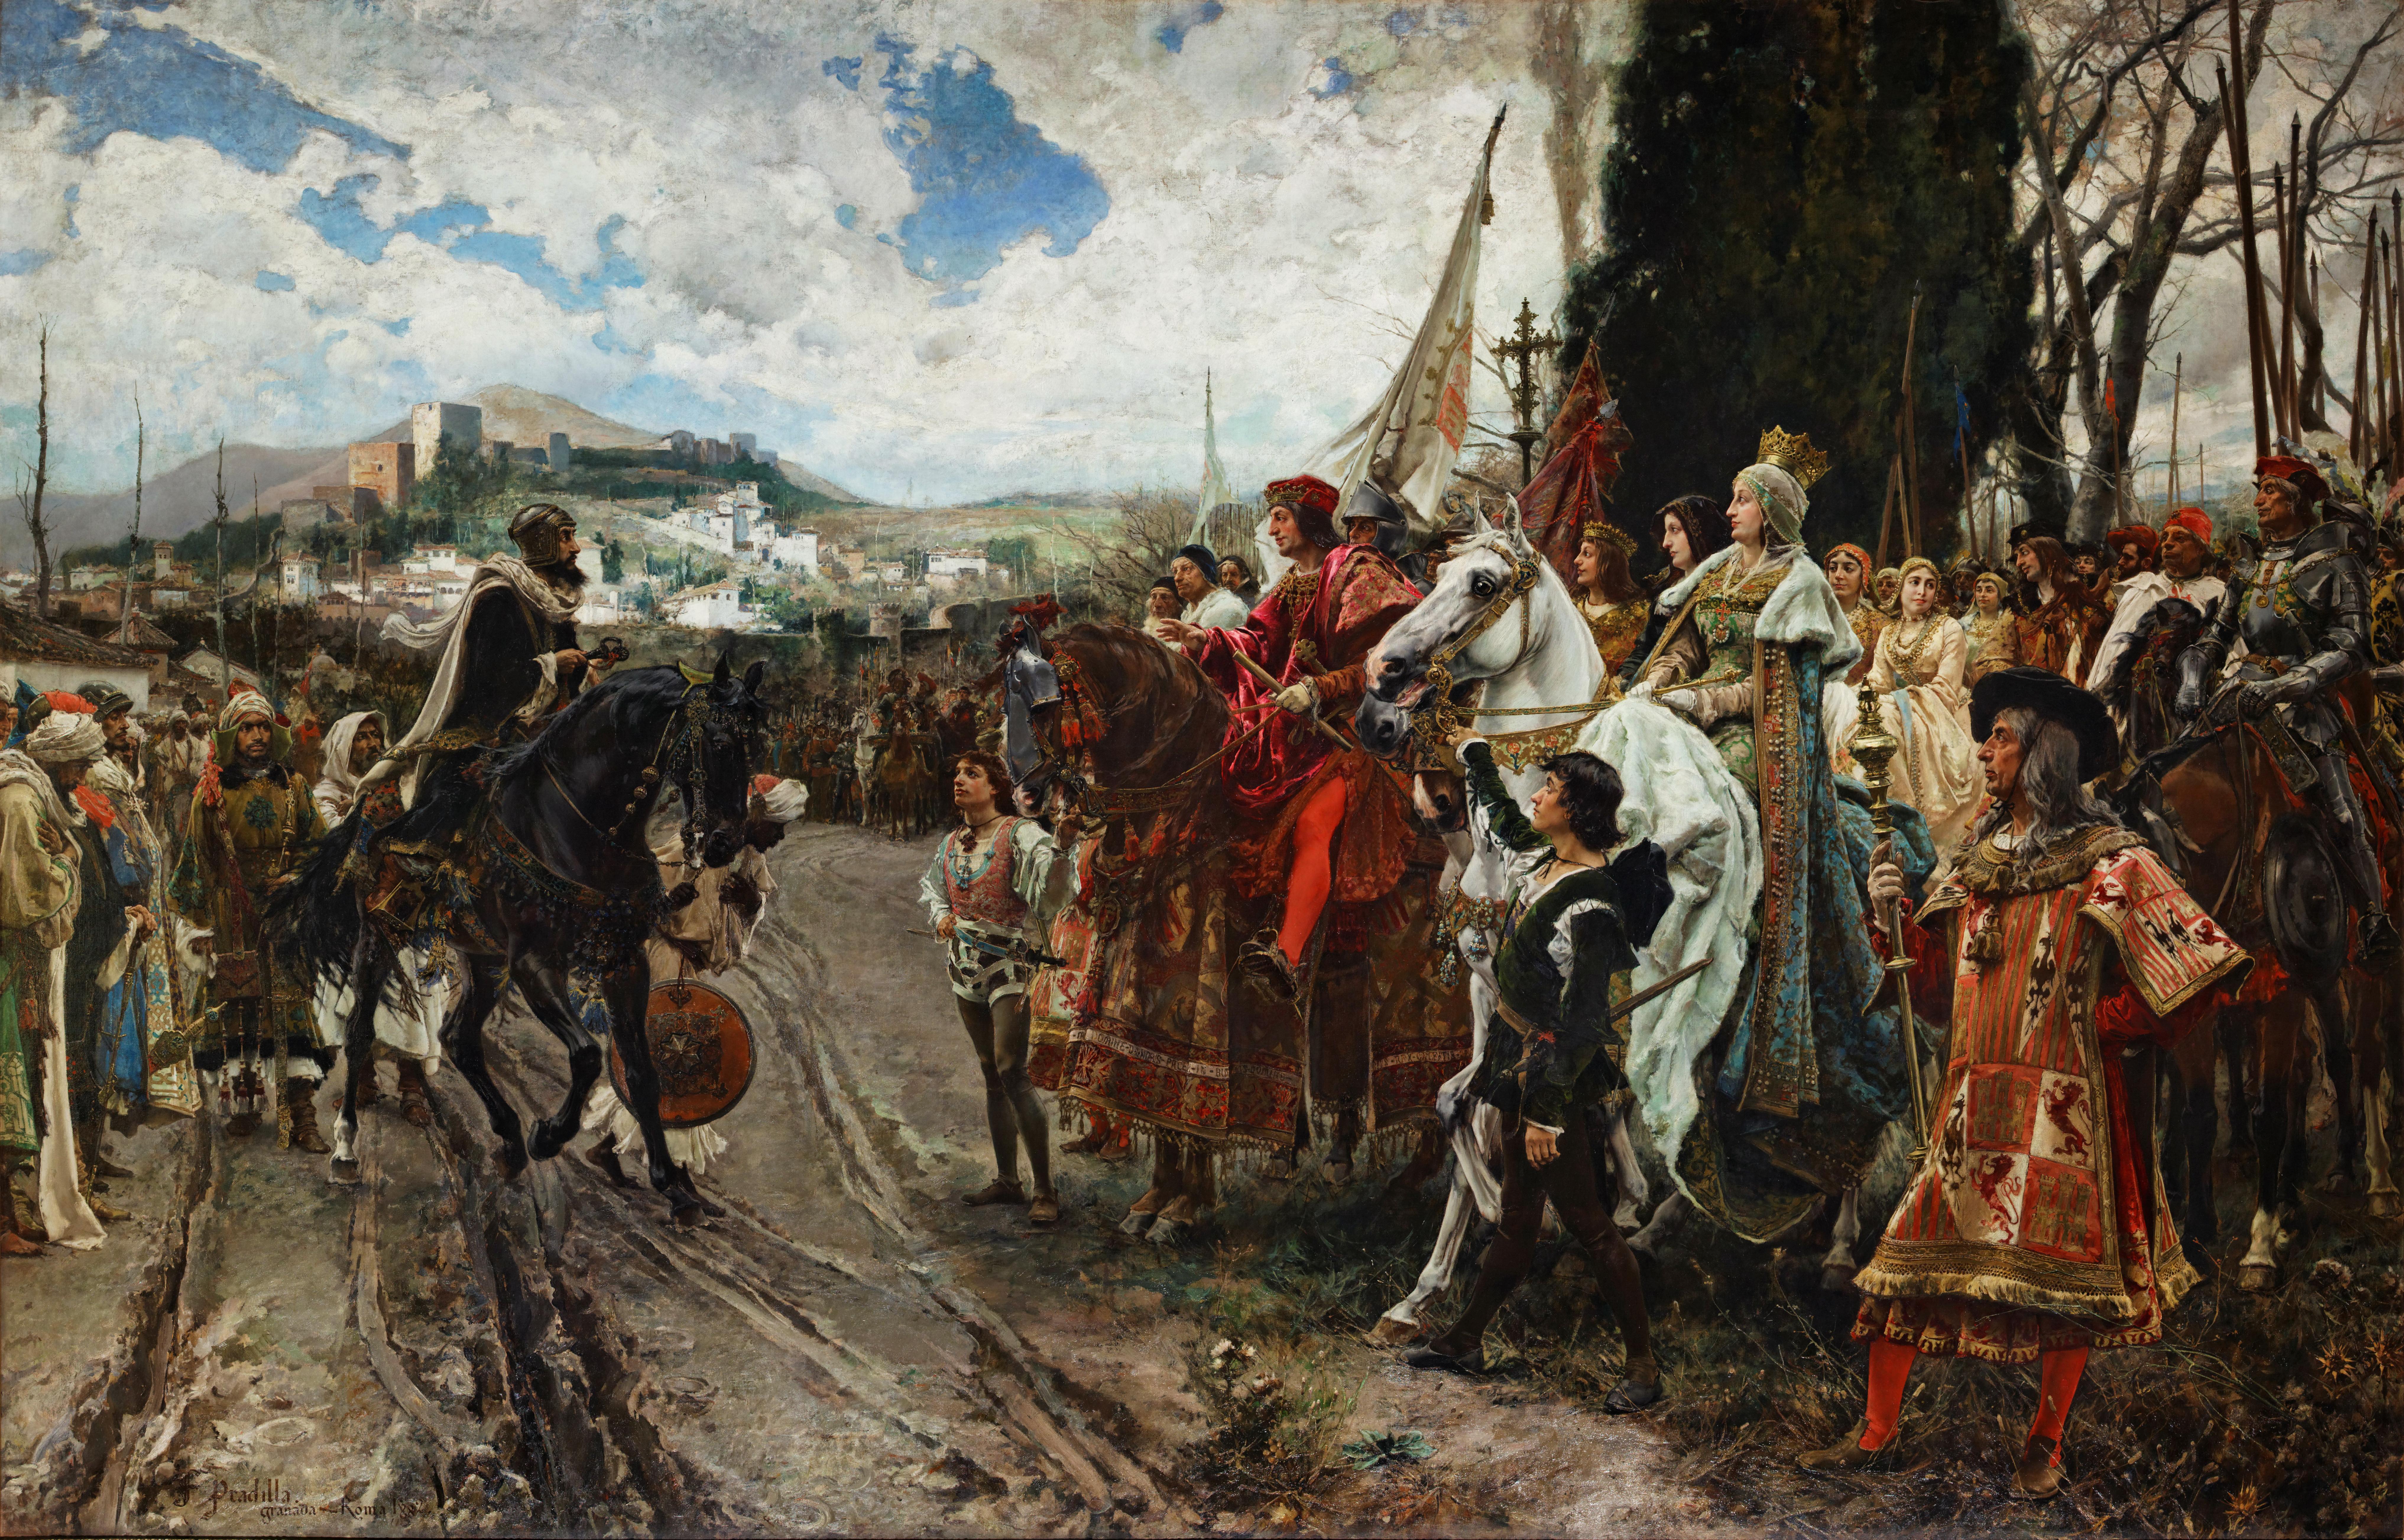 Depiction of Reconquista